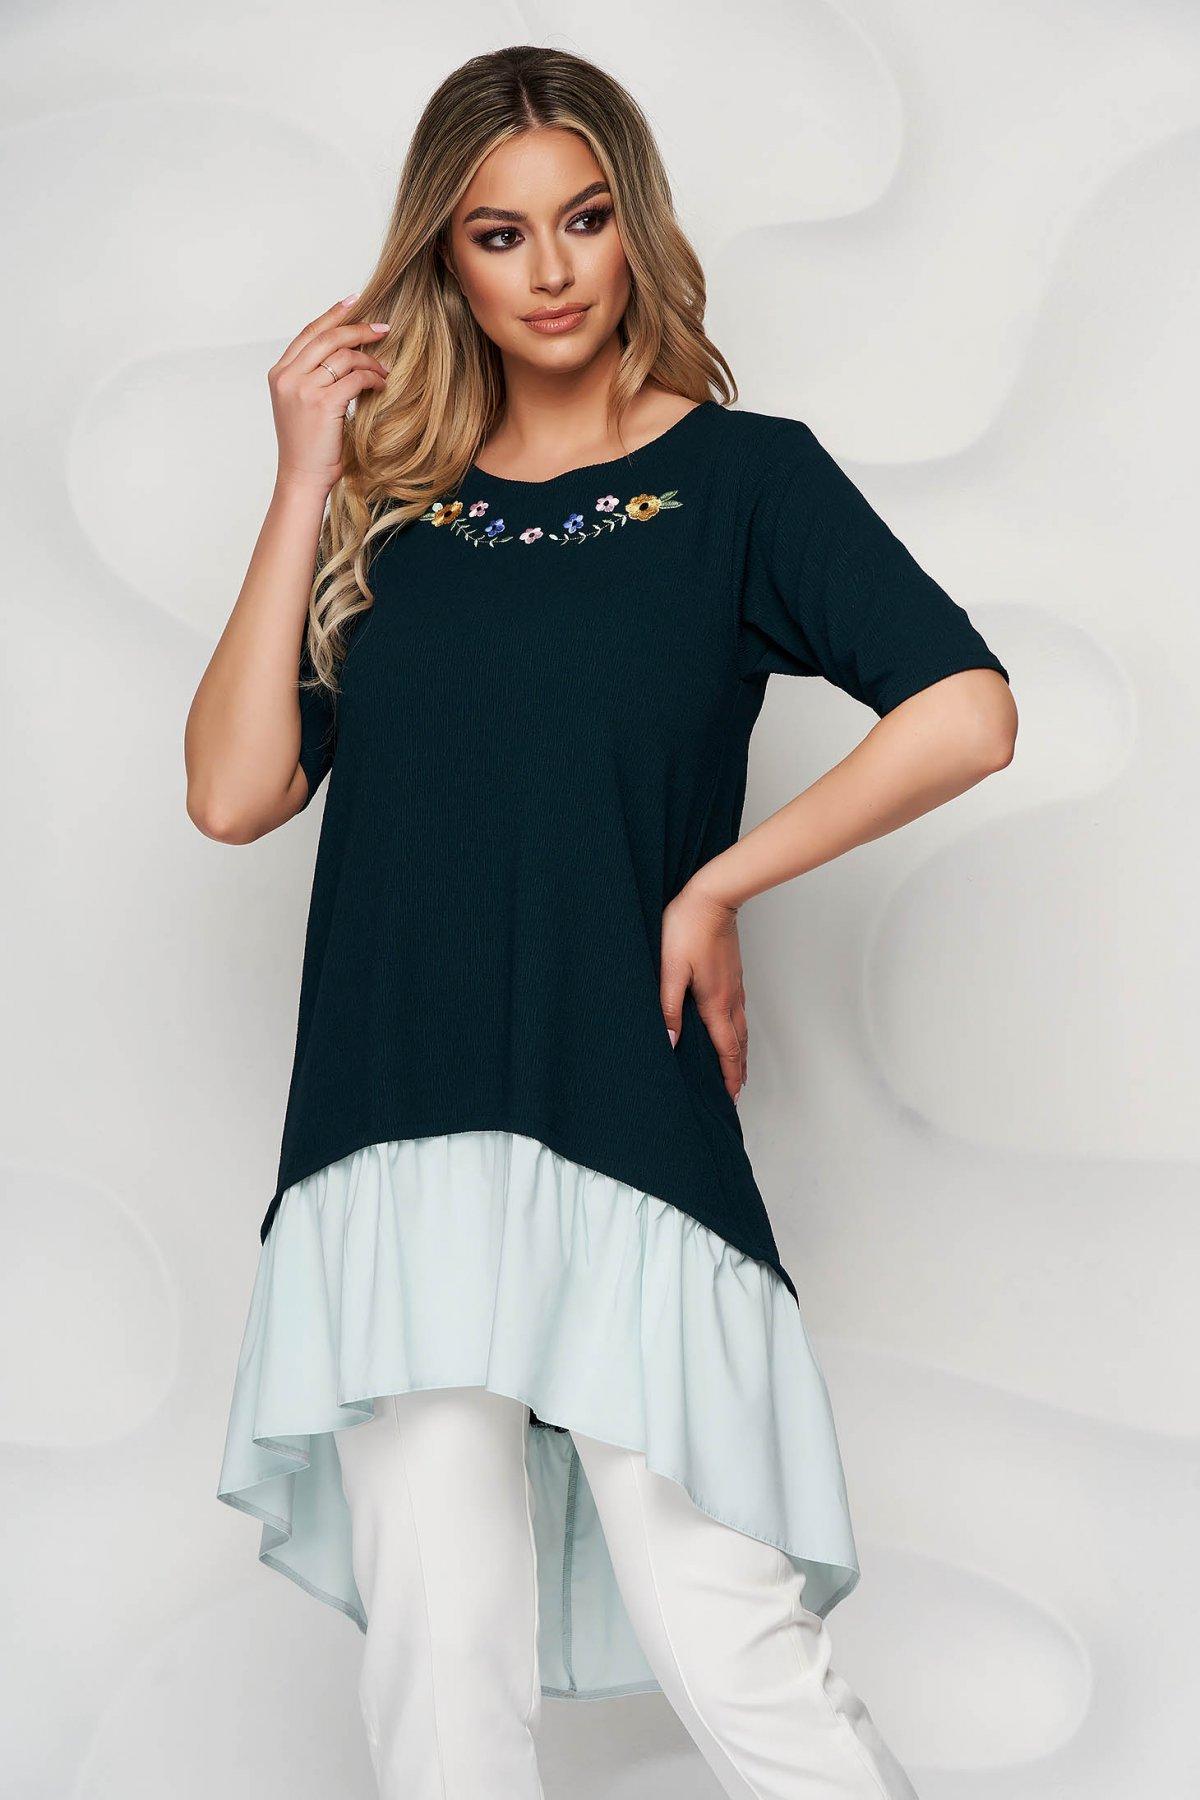 Bluza dama StarShinerS verde petrol asimetrica brodata cu croi larg si terminatie tip camasa